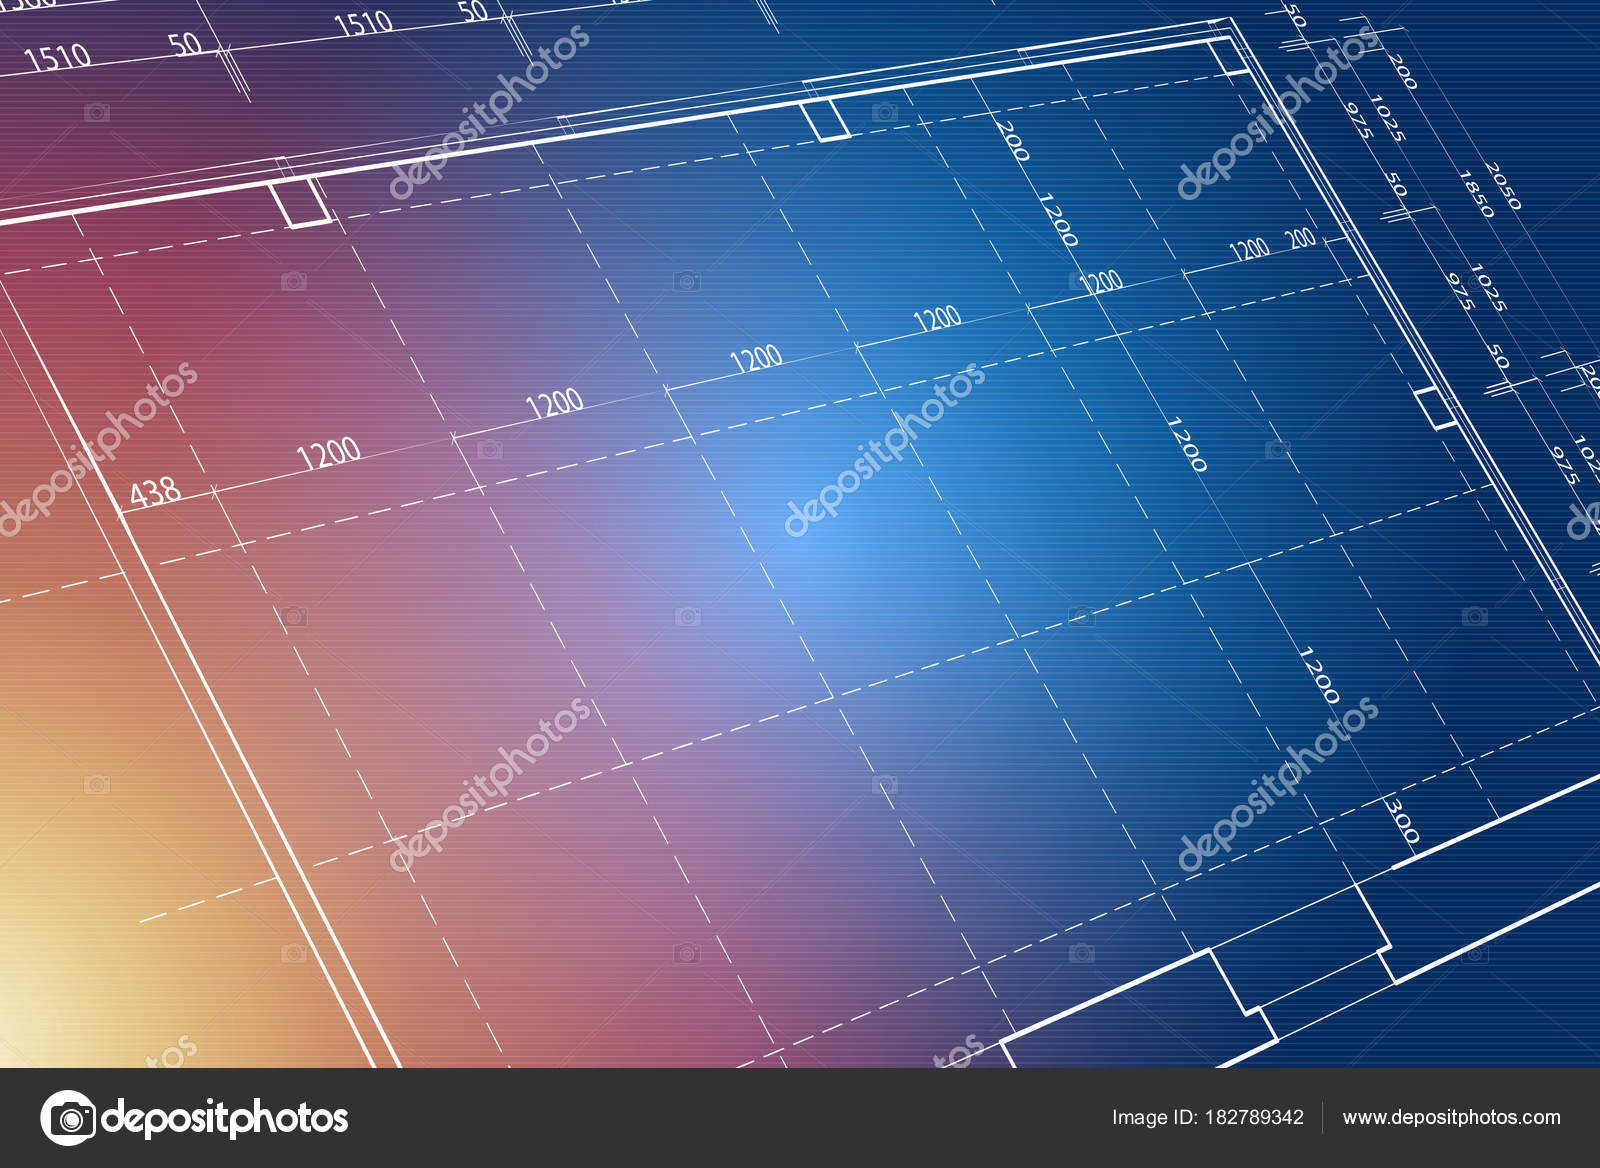 Blaupause-Hintergrund — Stockfoto © semisatch #182789342